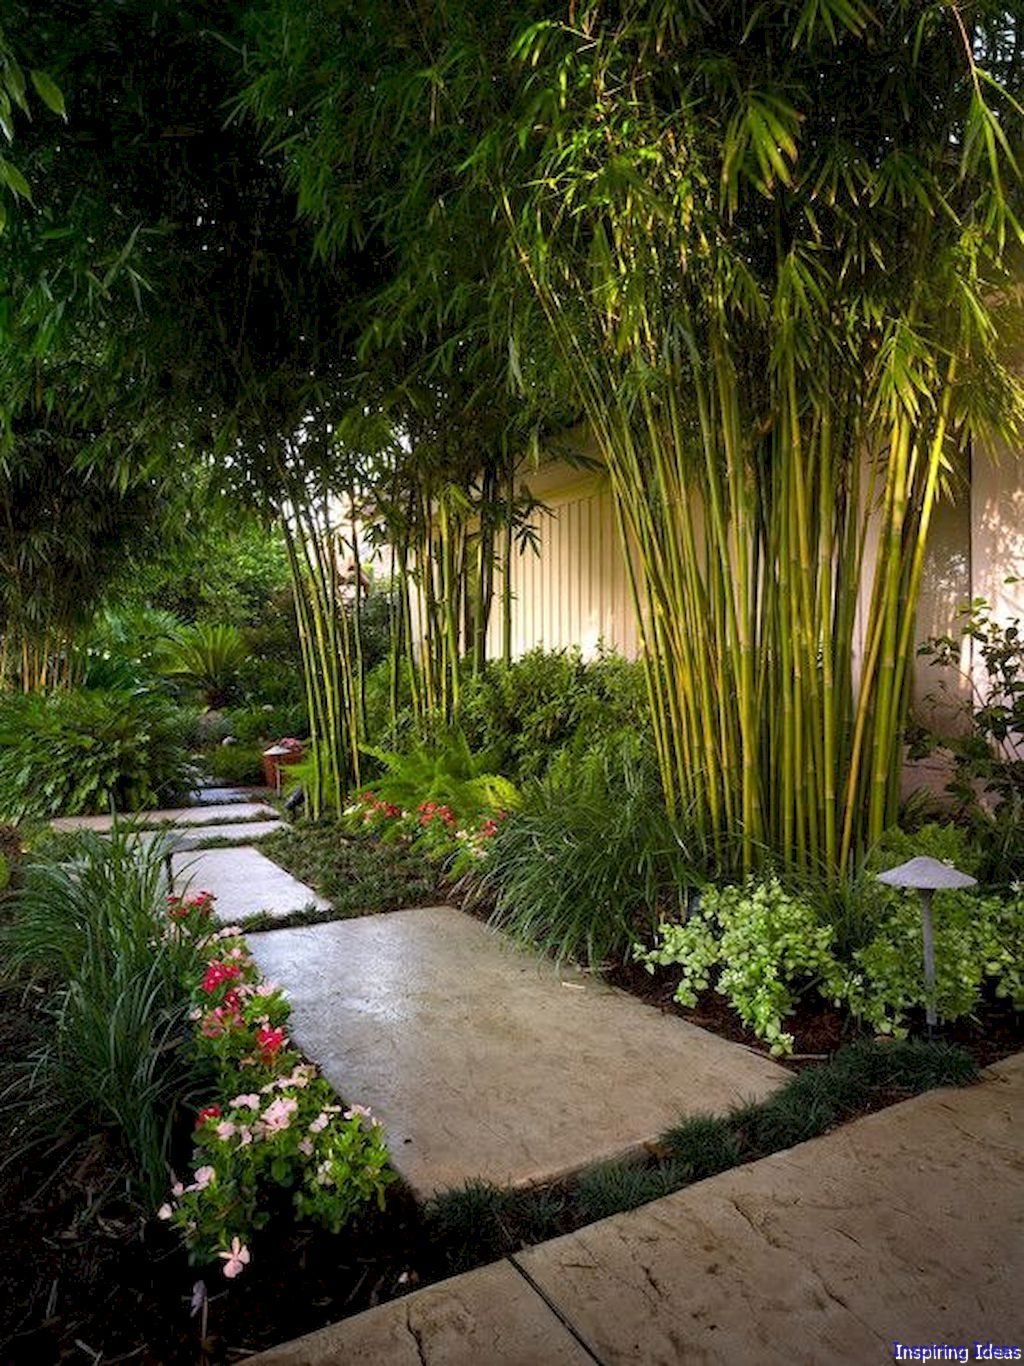 69 Beautiful Garden Design Ideas You Will Love 55